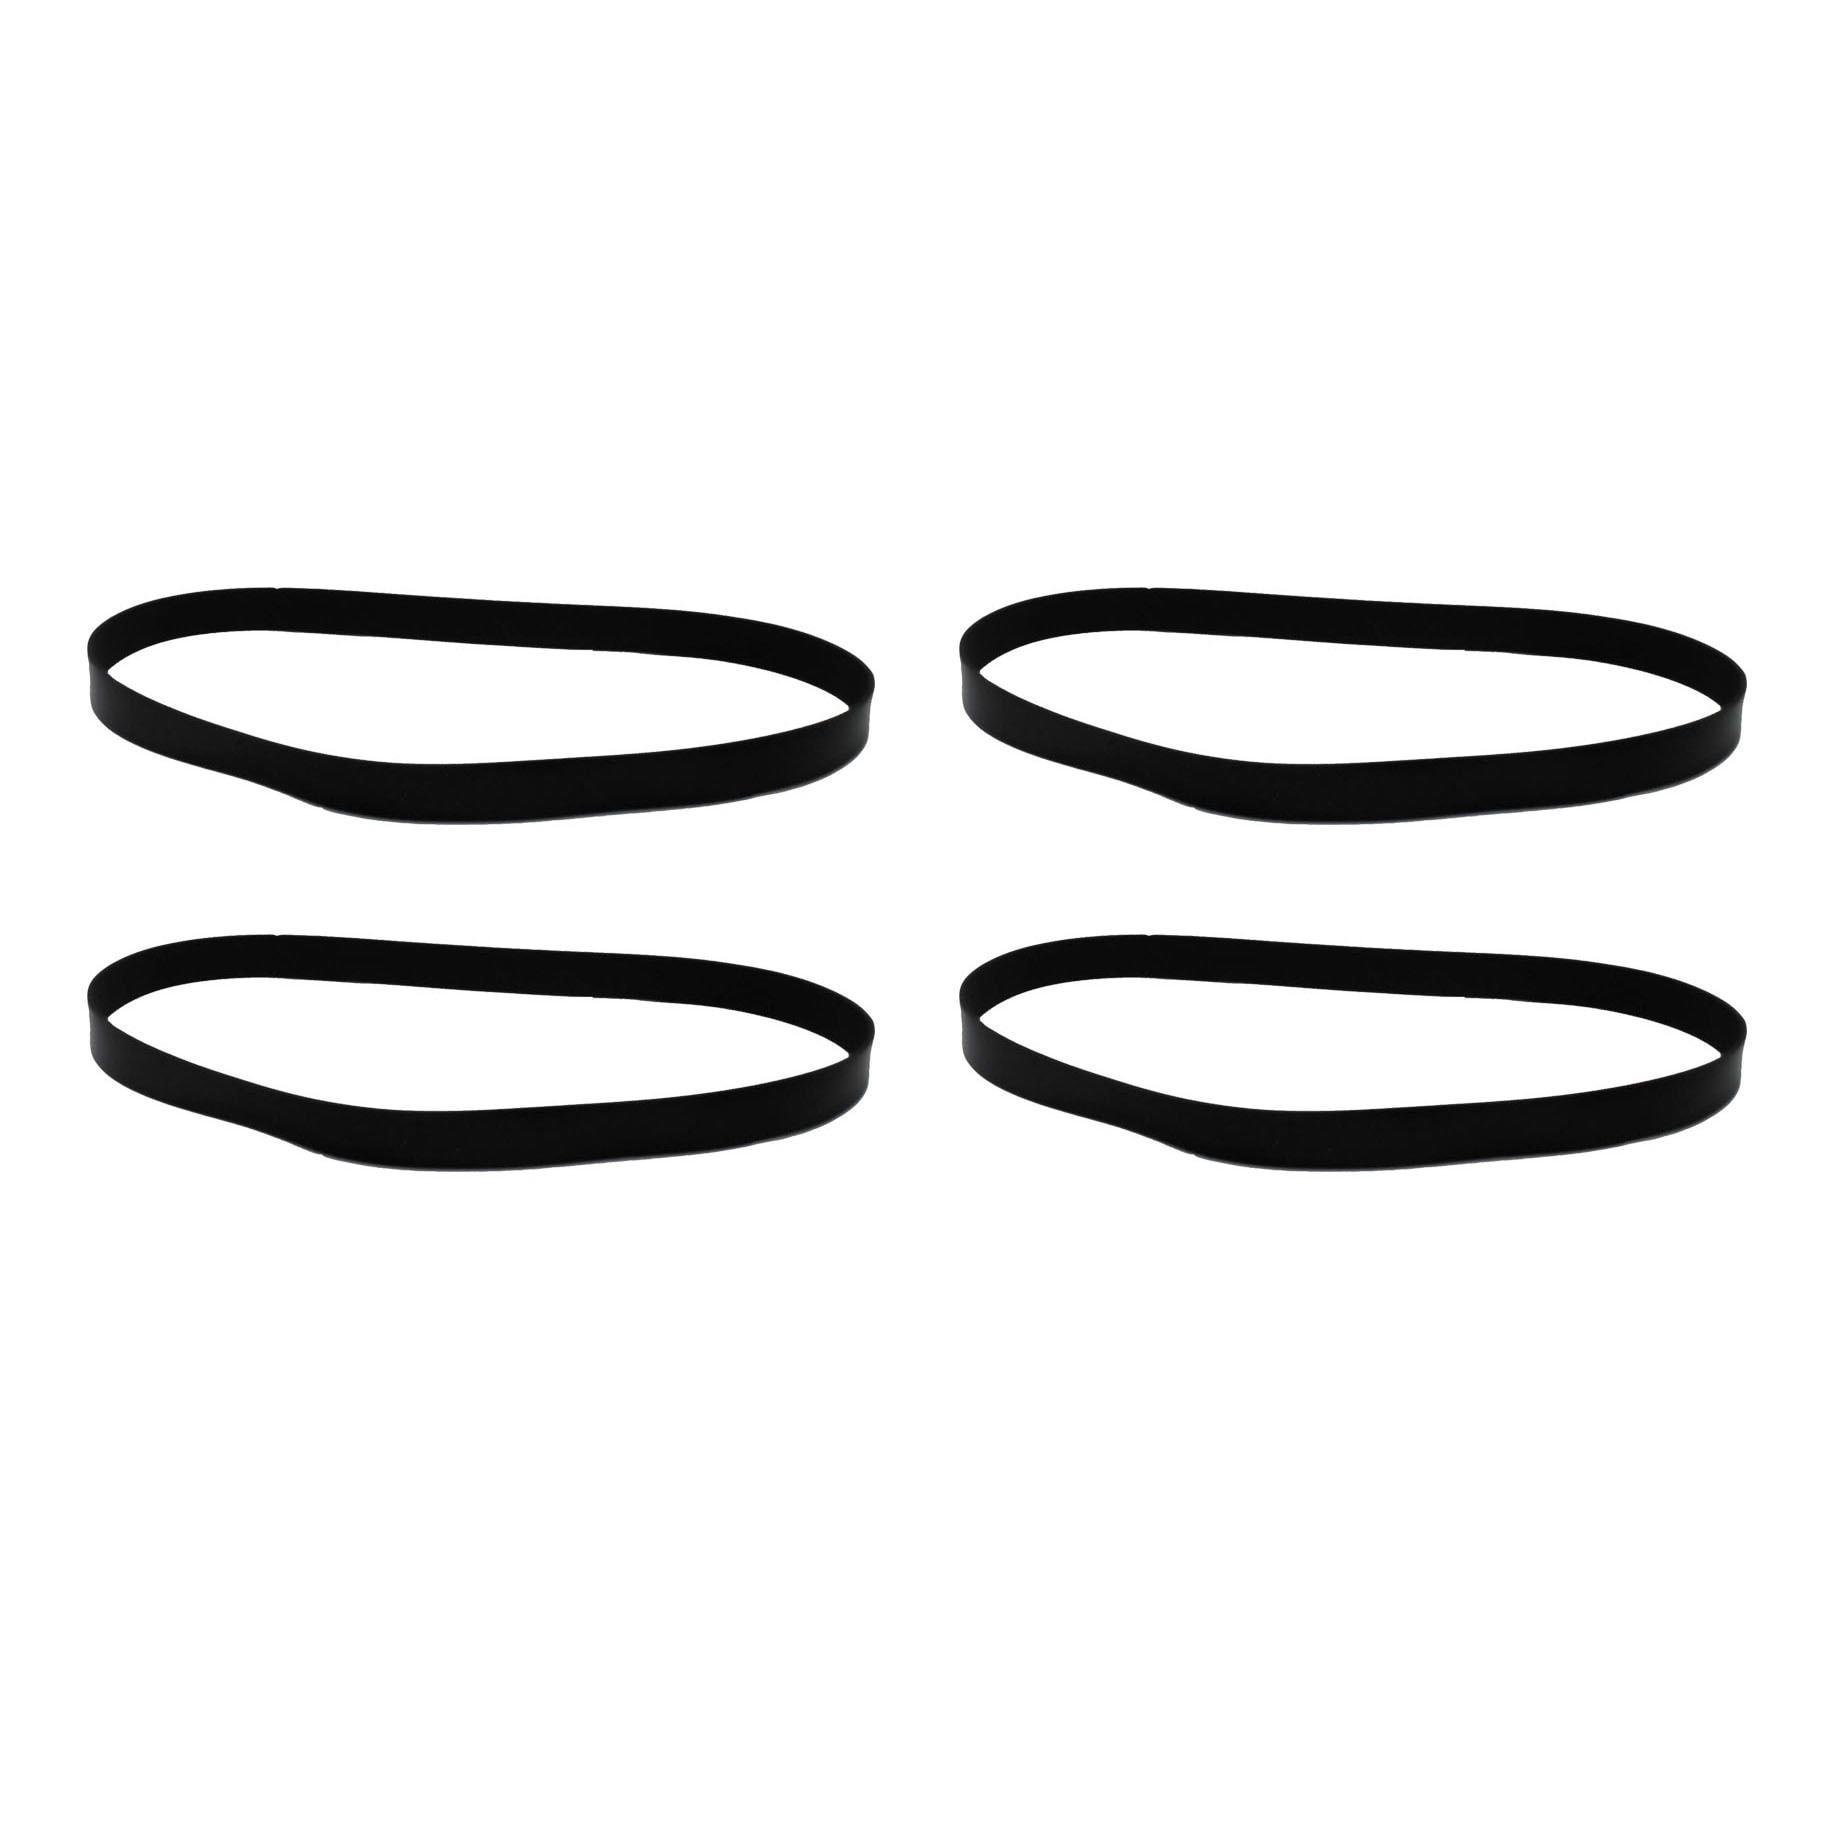 Crucial 4 Eureka Style S Belts Part # 84756 (vacuum belt)...